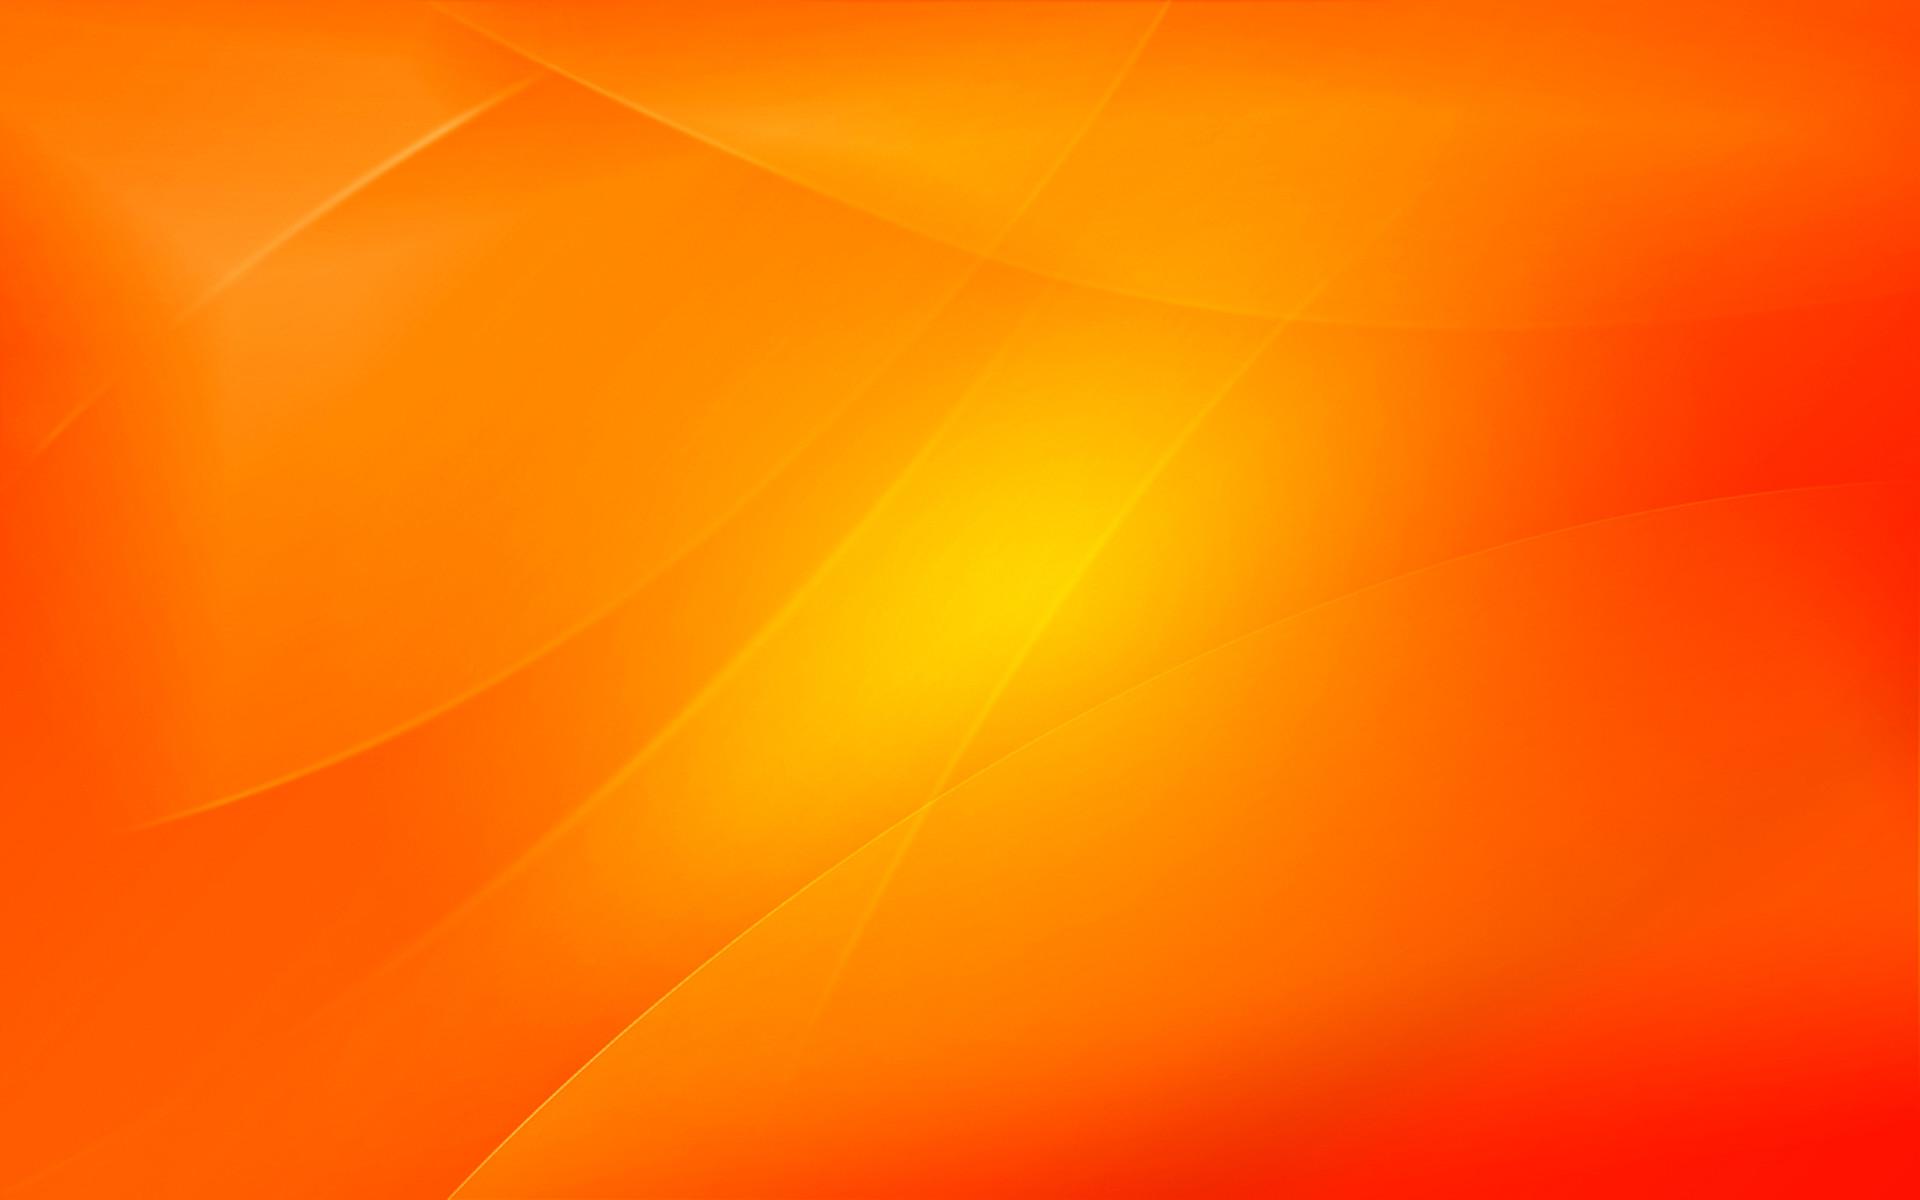 Orange Background Wallpaper Orange, Background